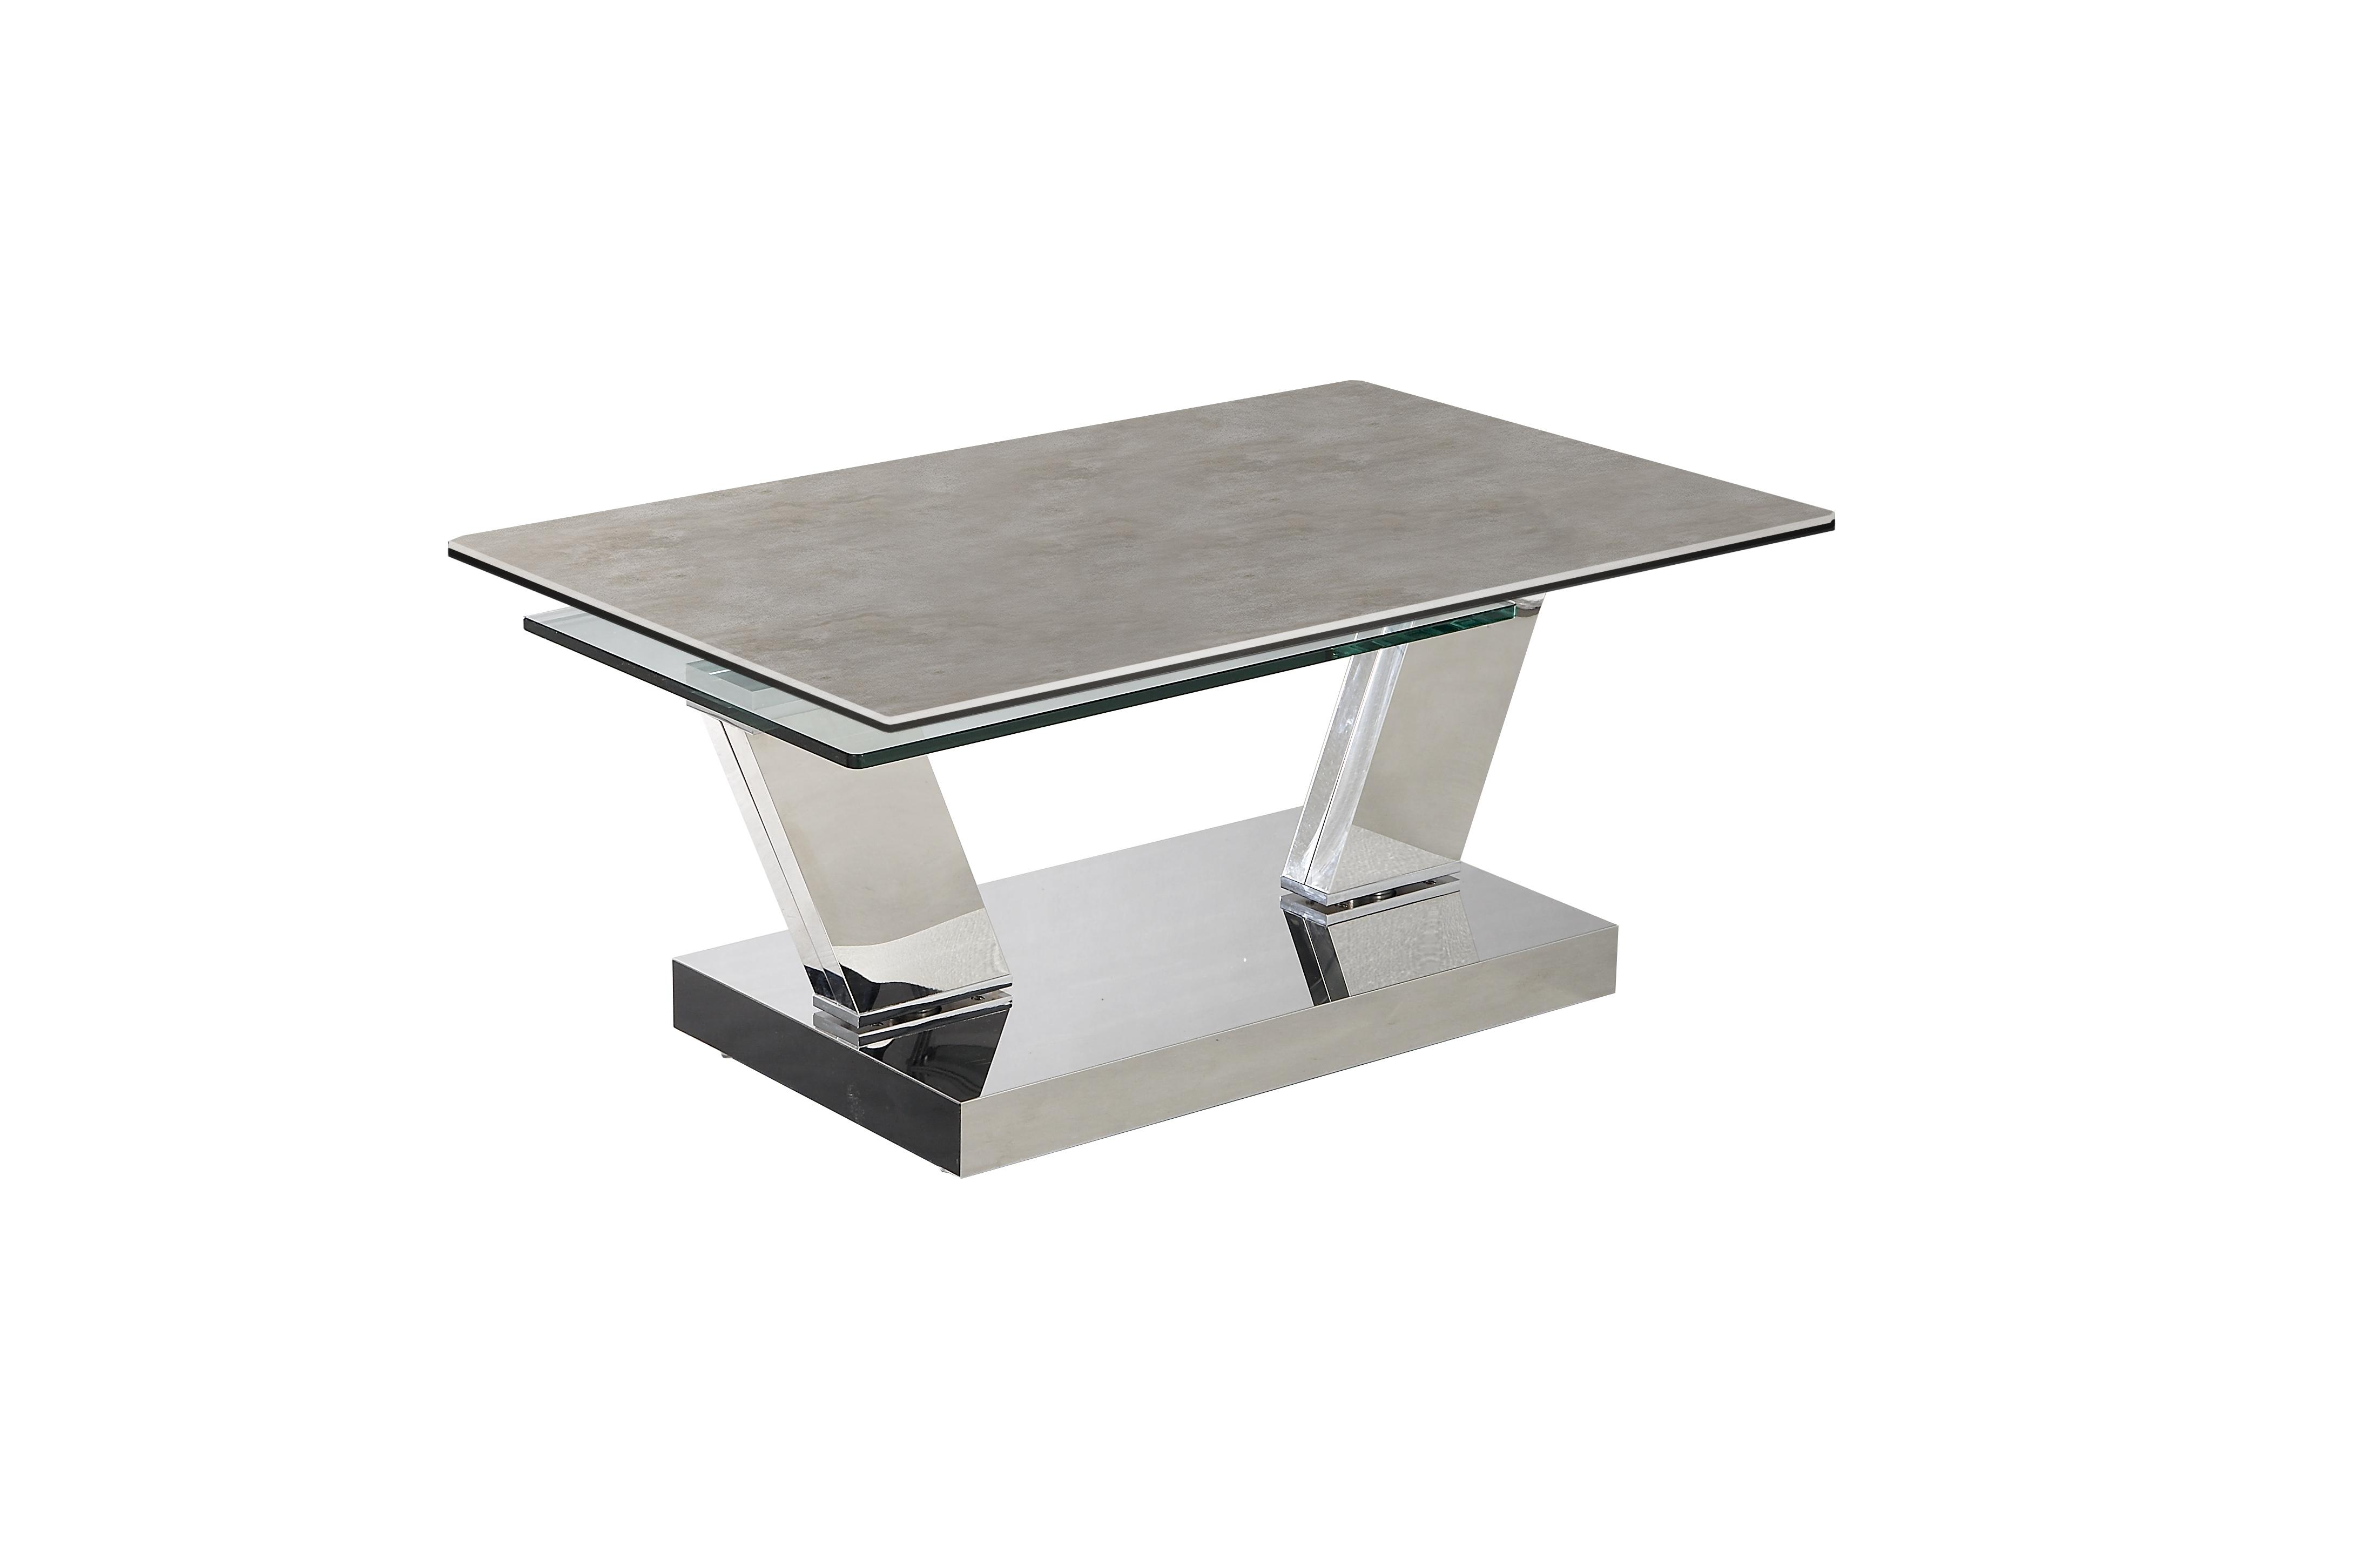 open ceramique light grey 8140 eda concept collection. Black Bedroom Furniture Sets. Home Design Ideas